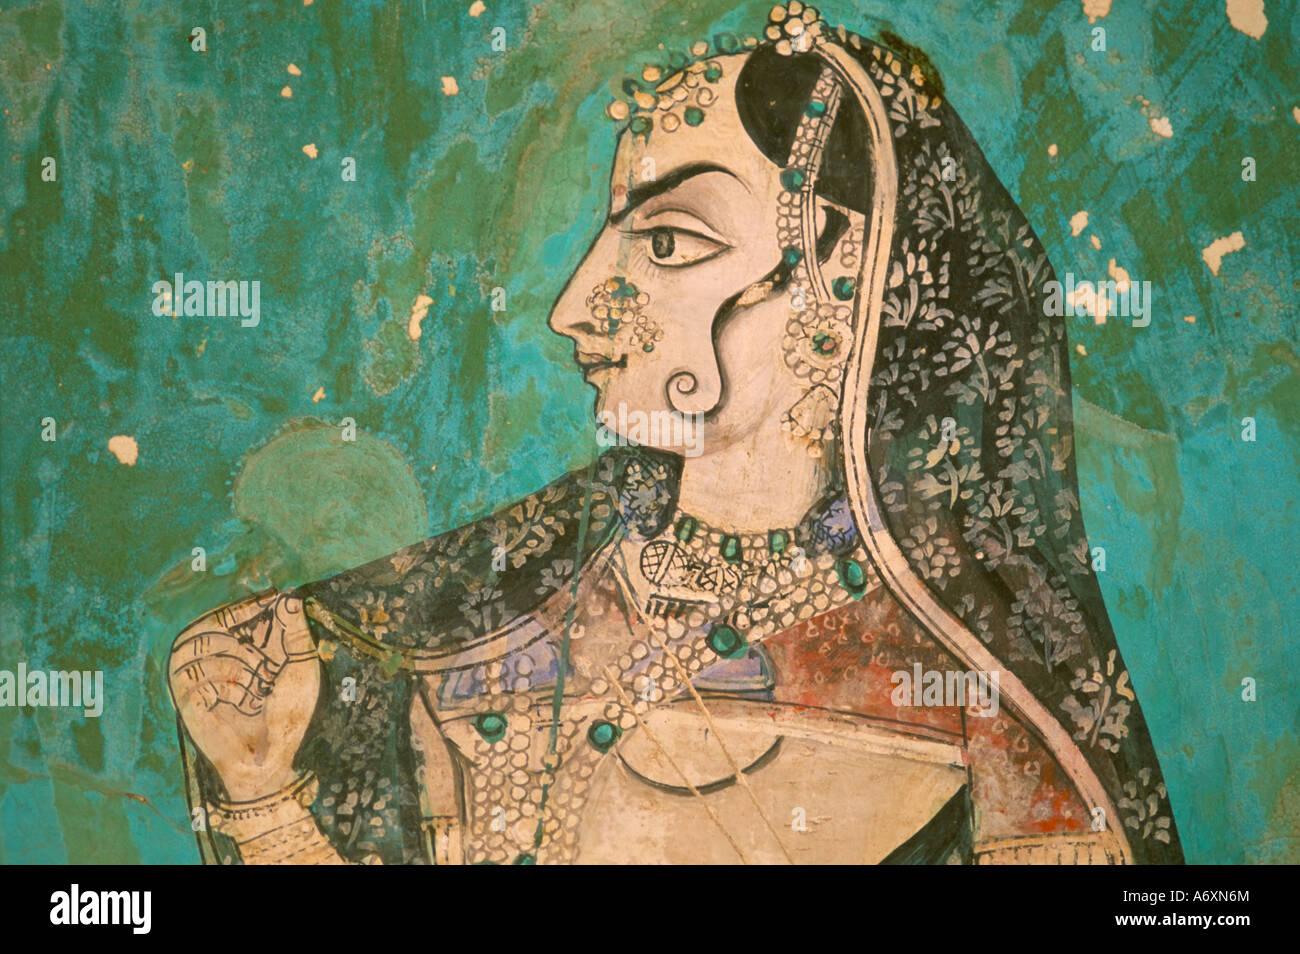 Pittura nel palazzo di Bundi Rajasthan India Asia Immagini Stock